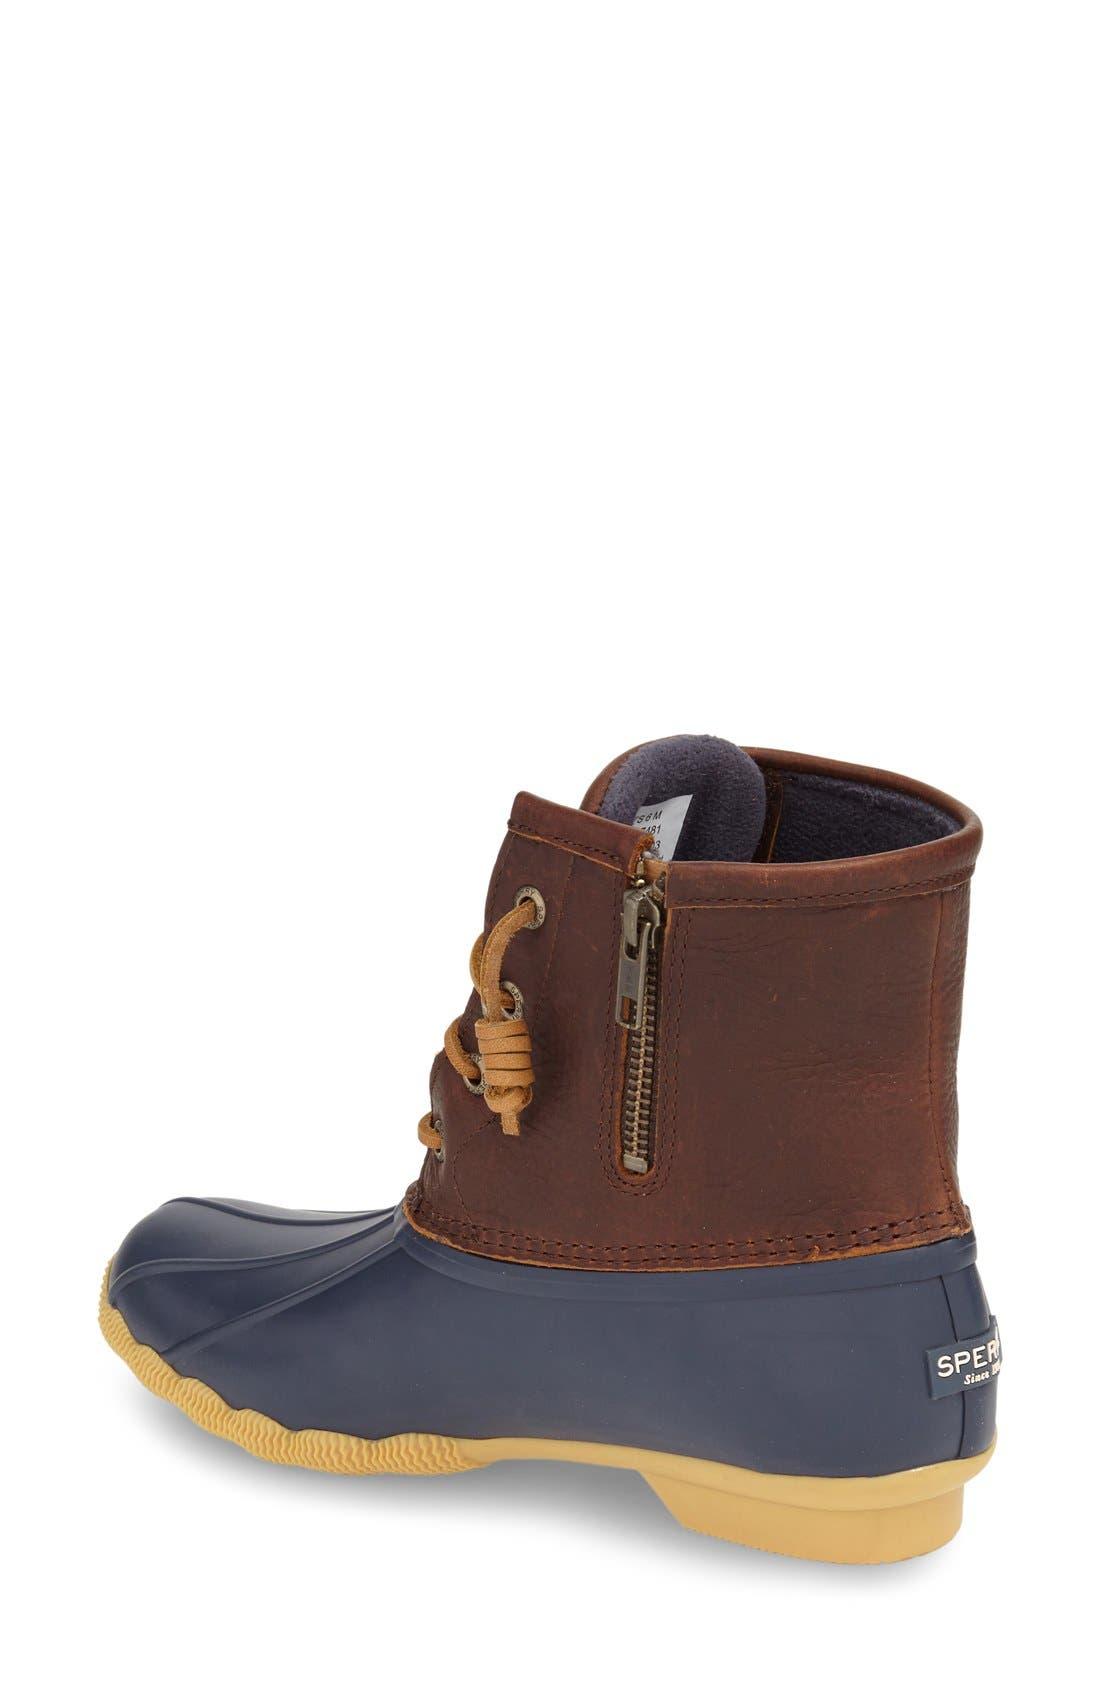 Alternate Image 2  - Sperry Saltwater Thinsulate™ Waterproof Rain Boot (Women)